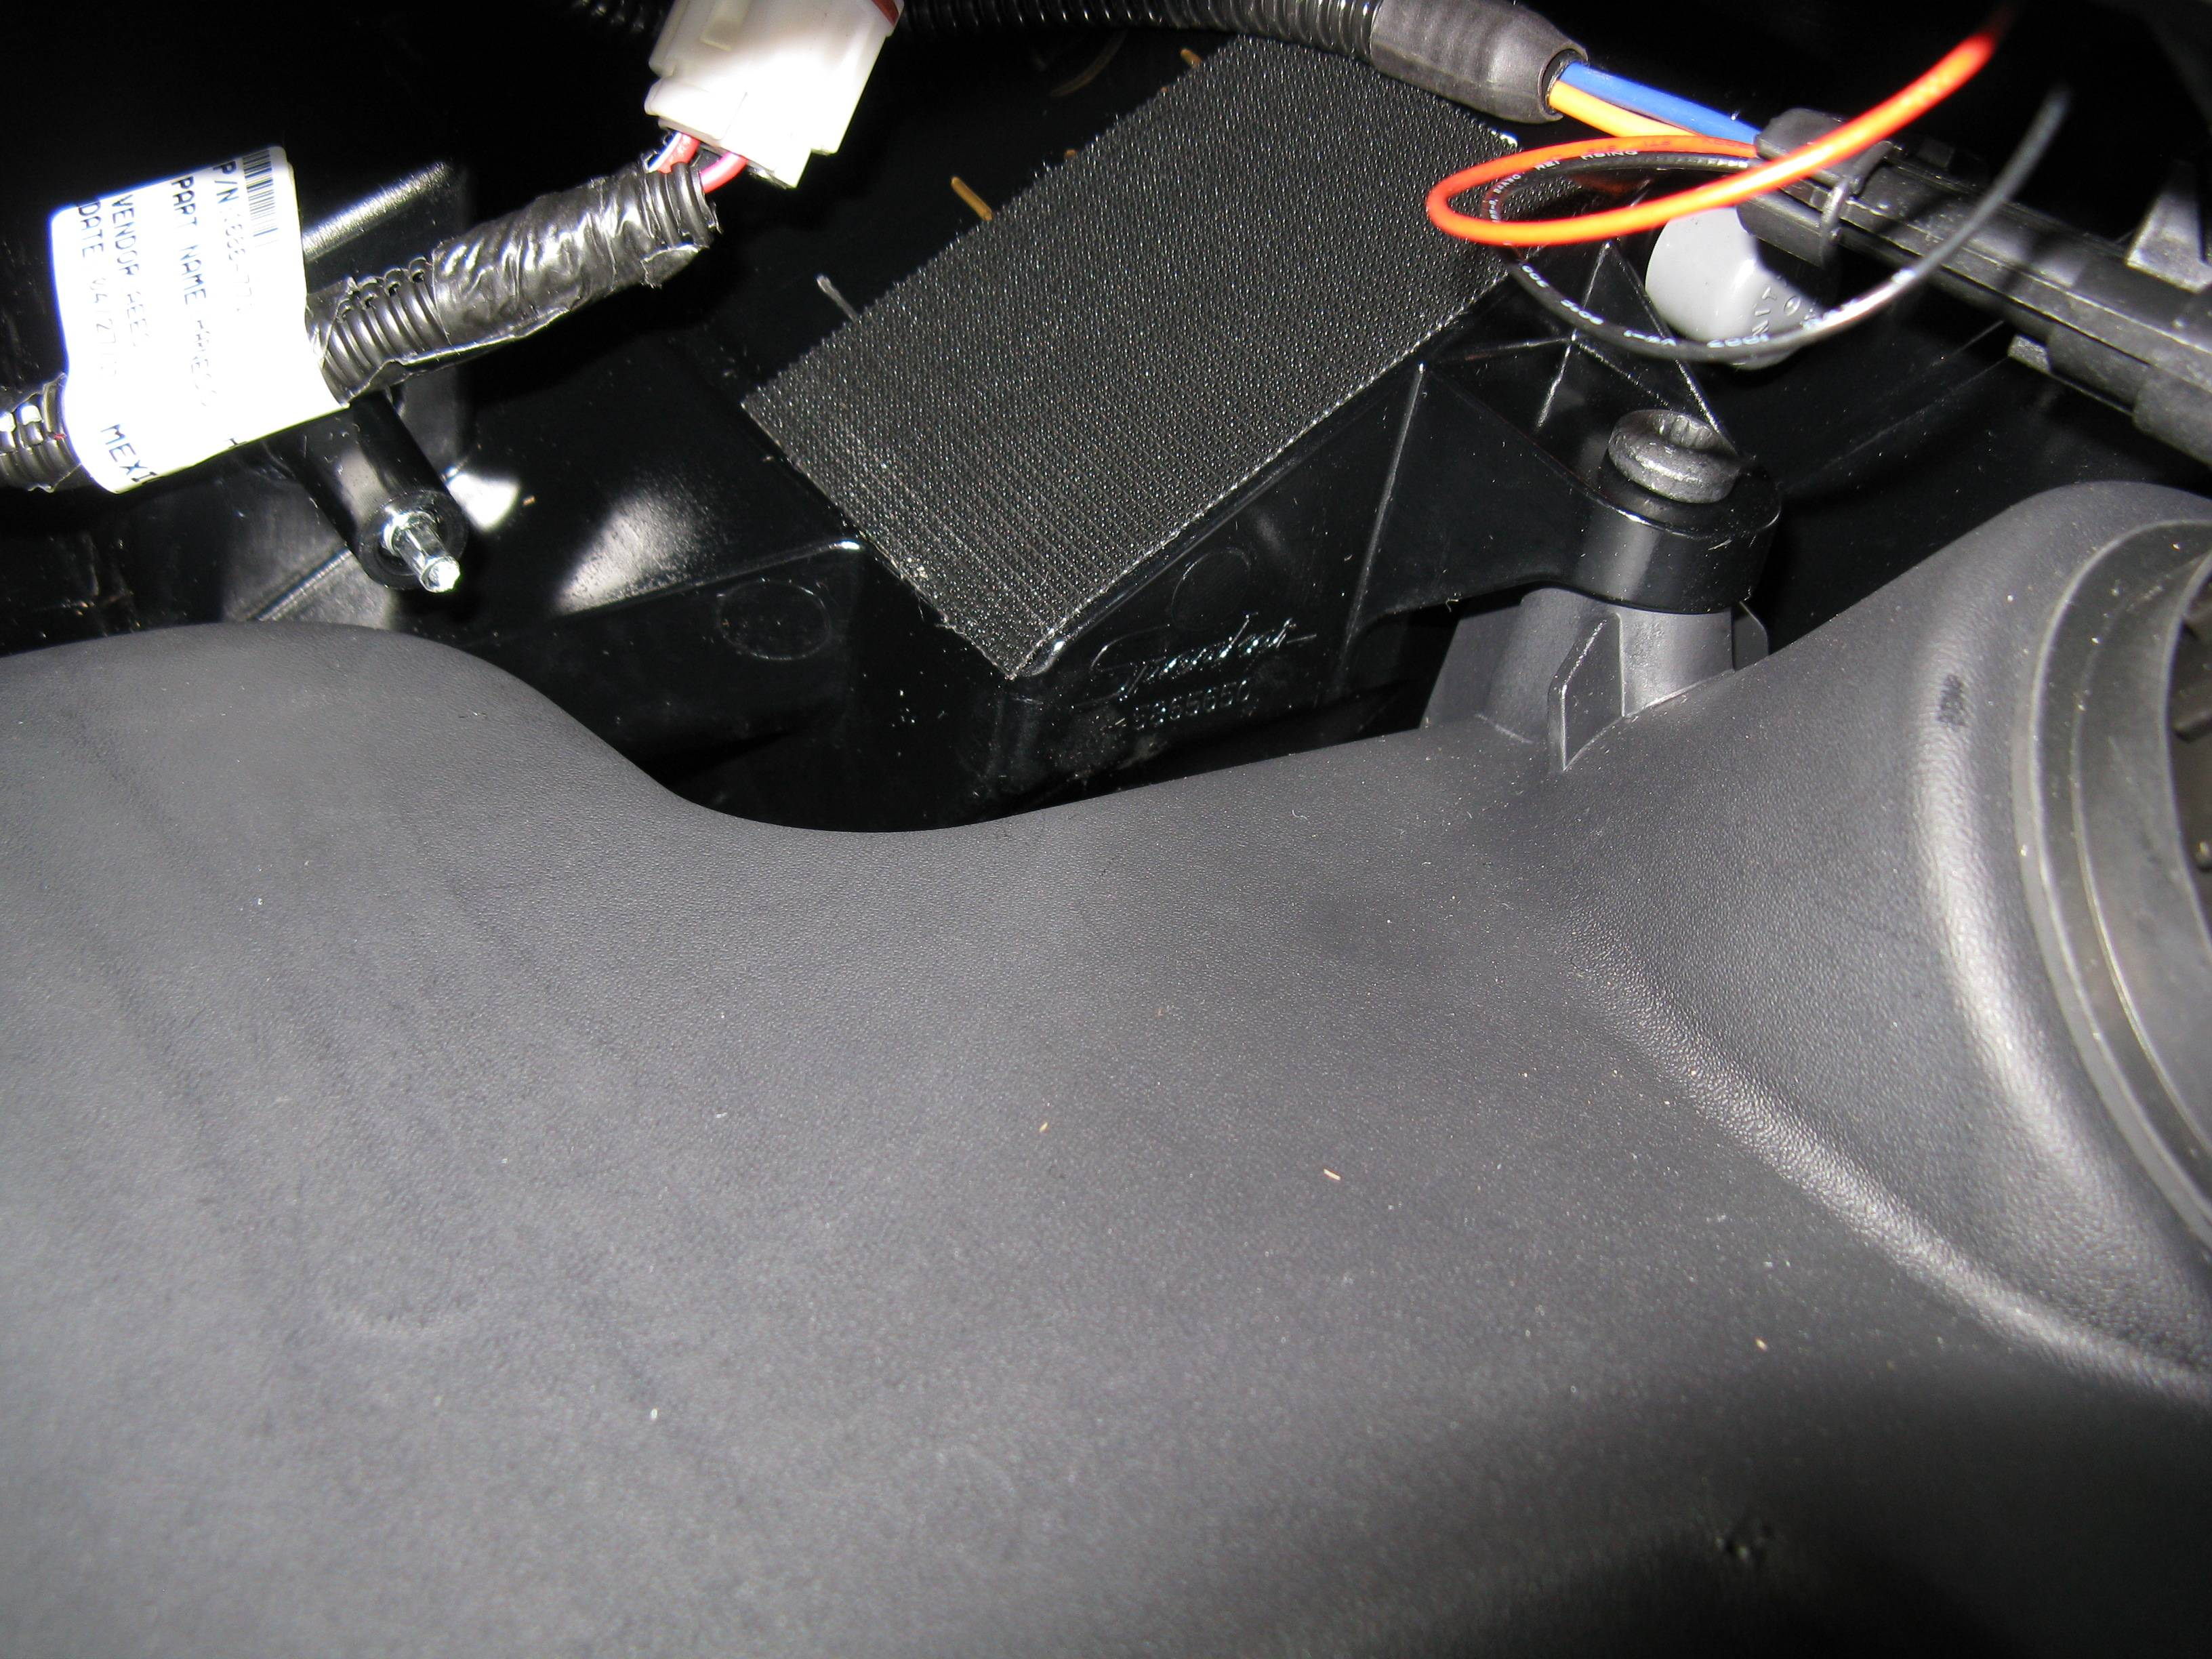 Applied Velcro pad